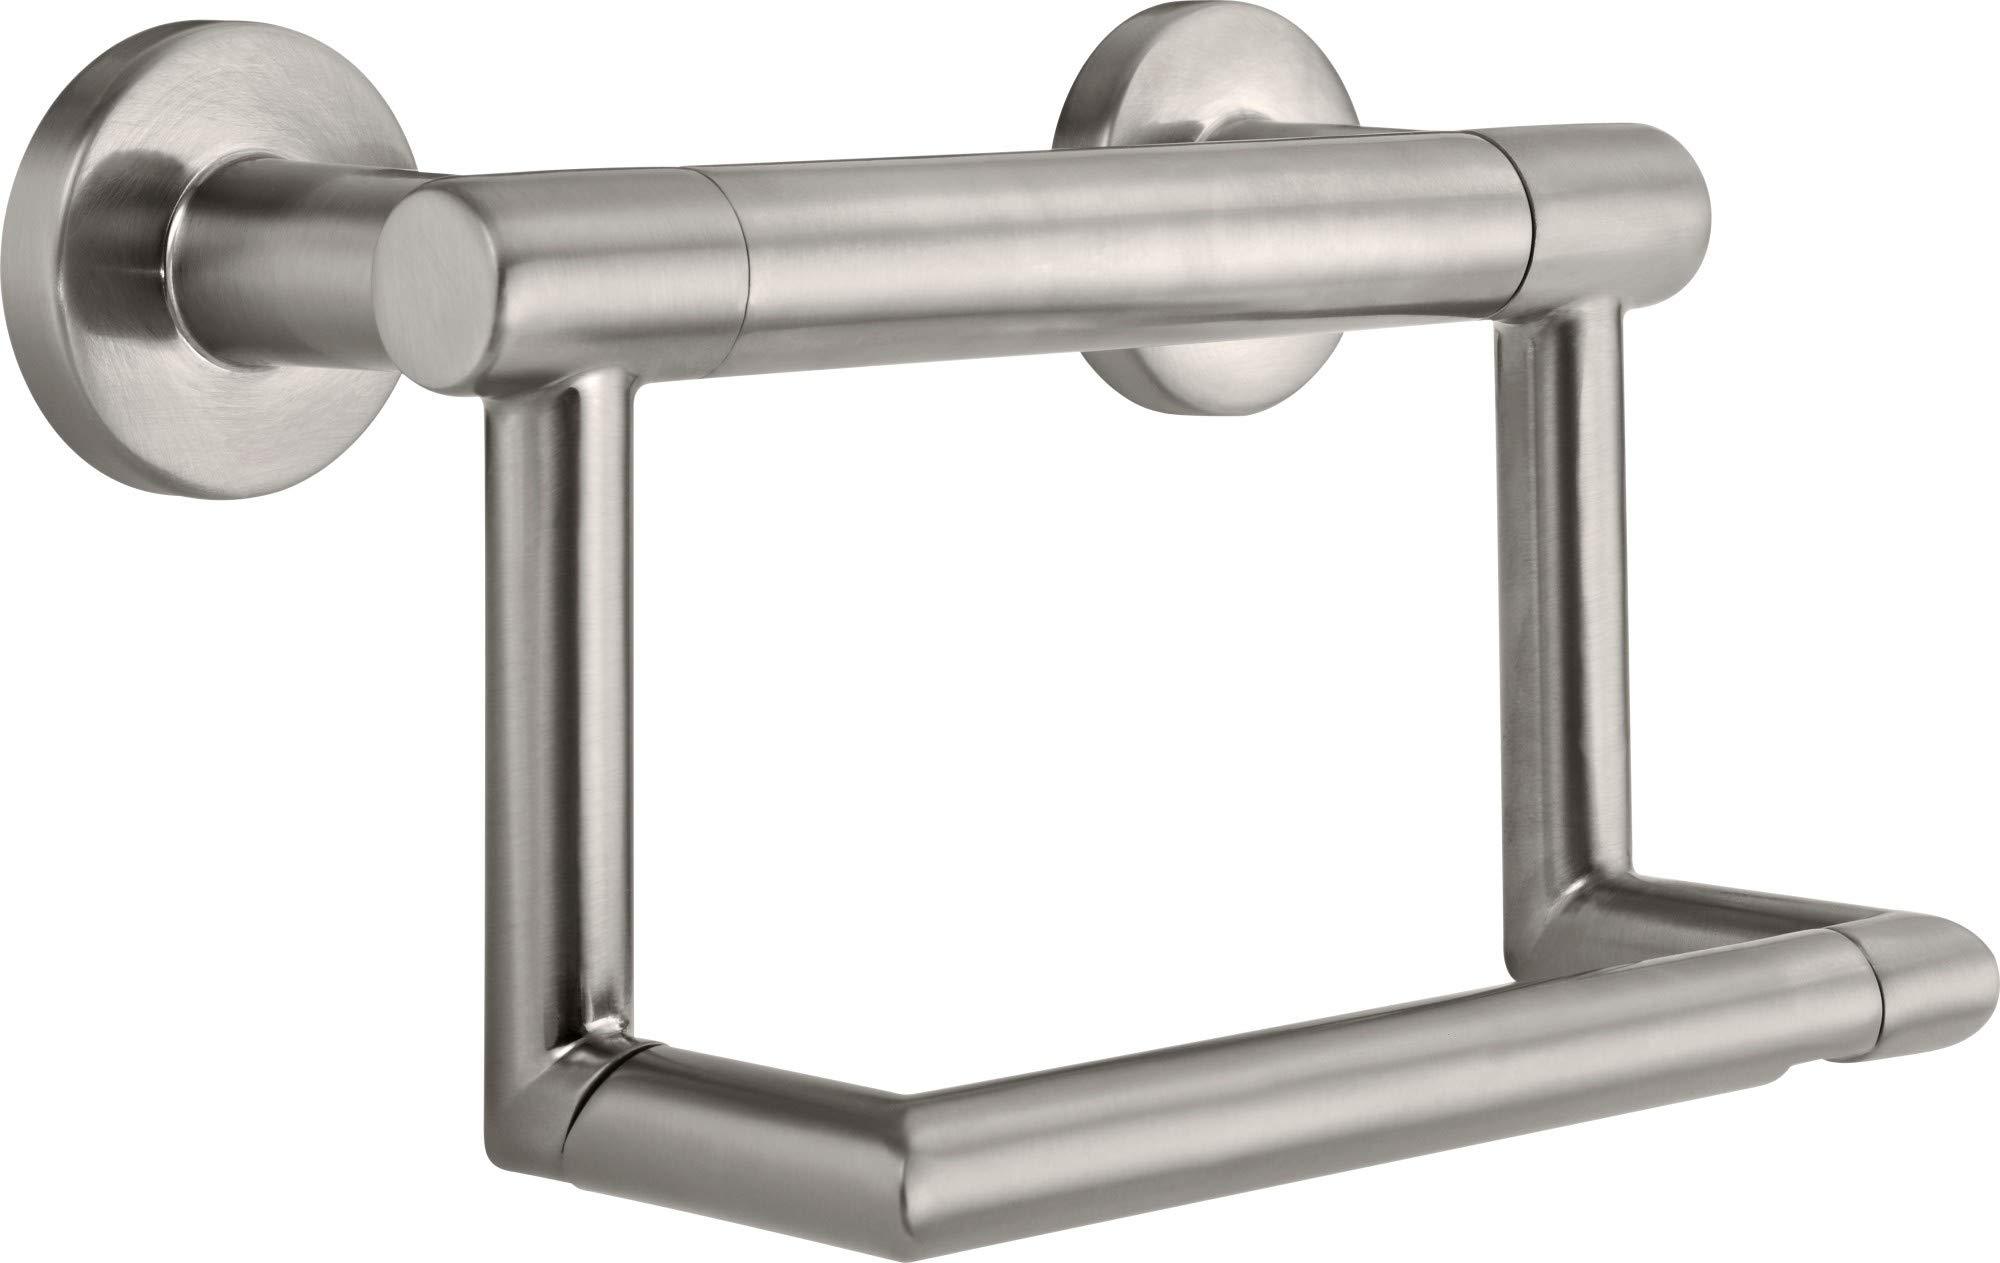 Delta 41550 Decor Assist Pivoting Tissue Holder, Brilliance Stainless